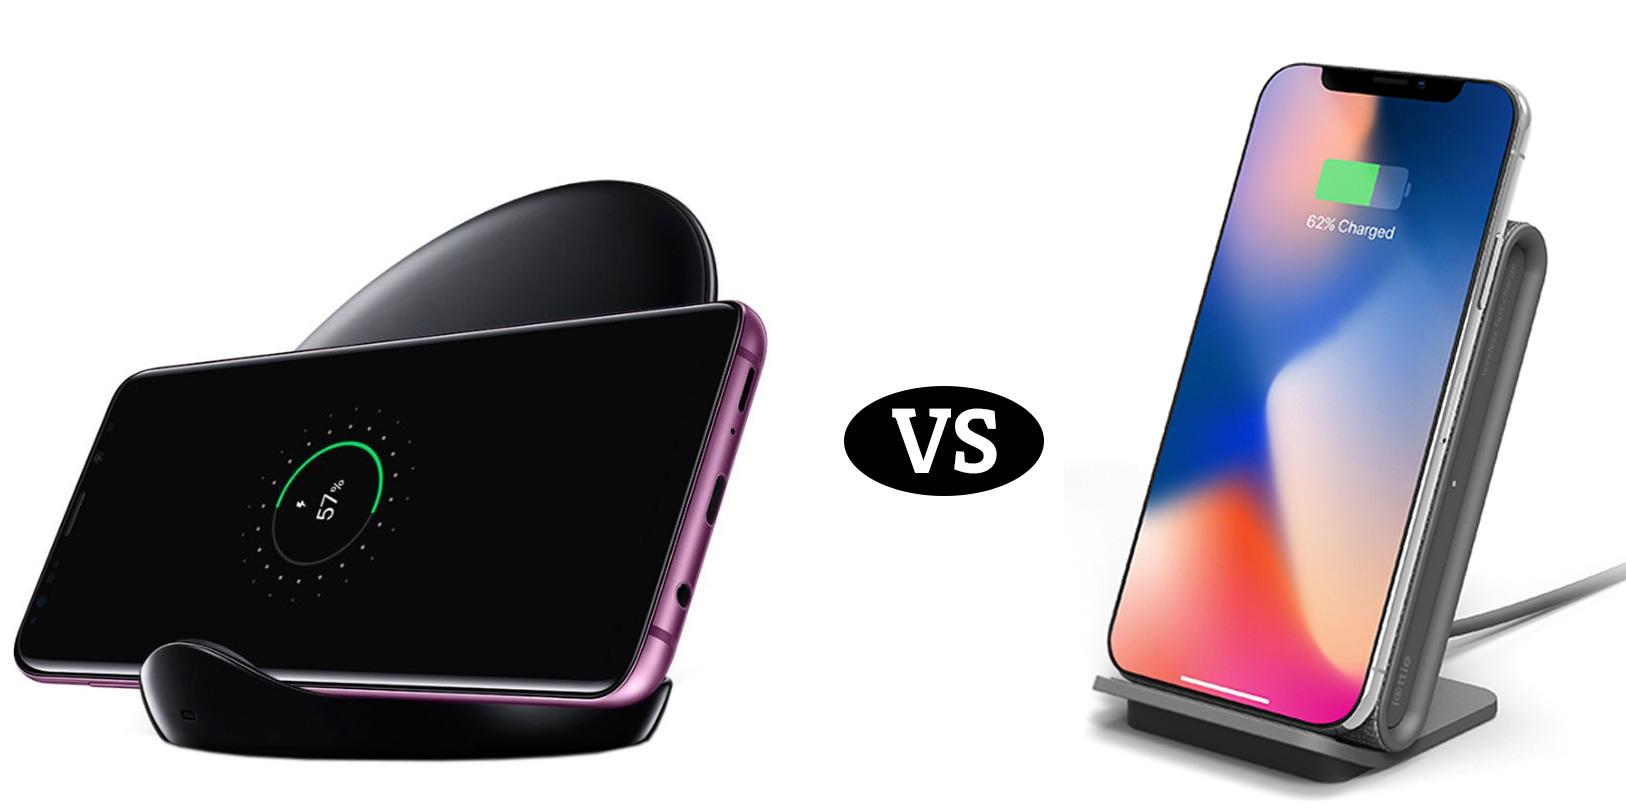 Samsung VS iOttie: Best Standing Wireless Charger